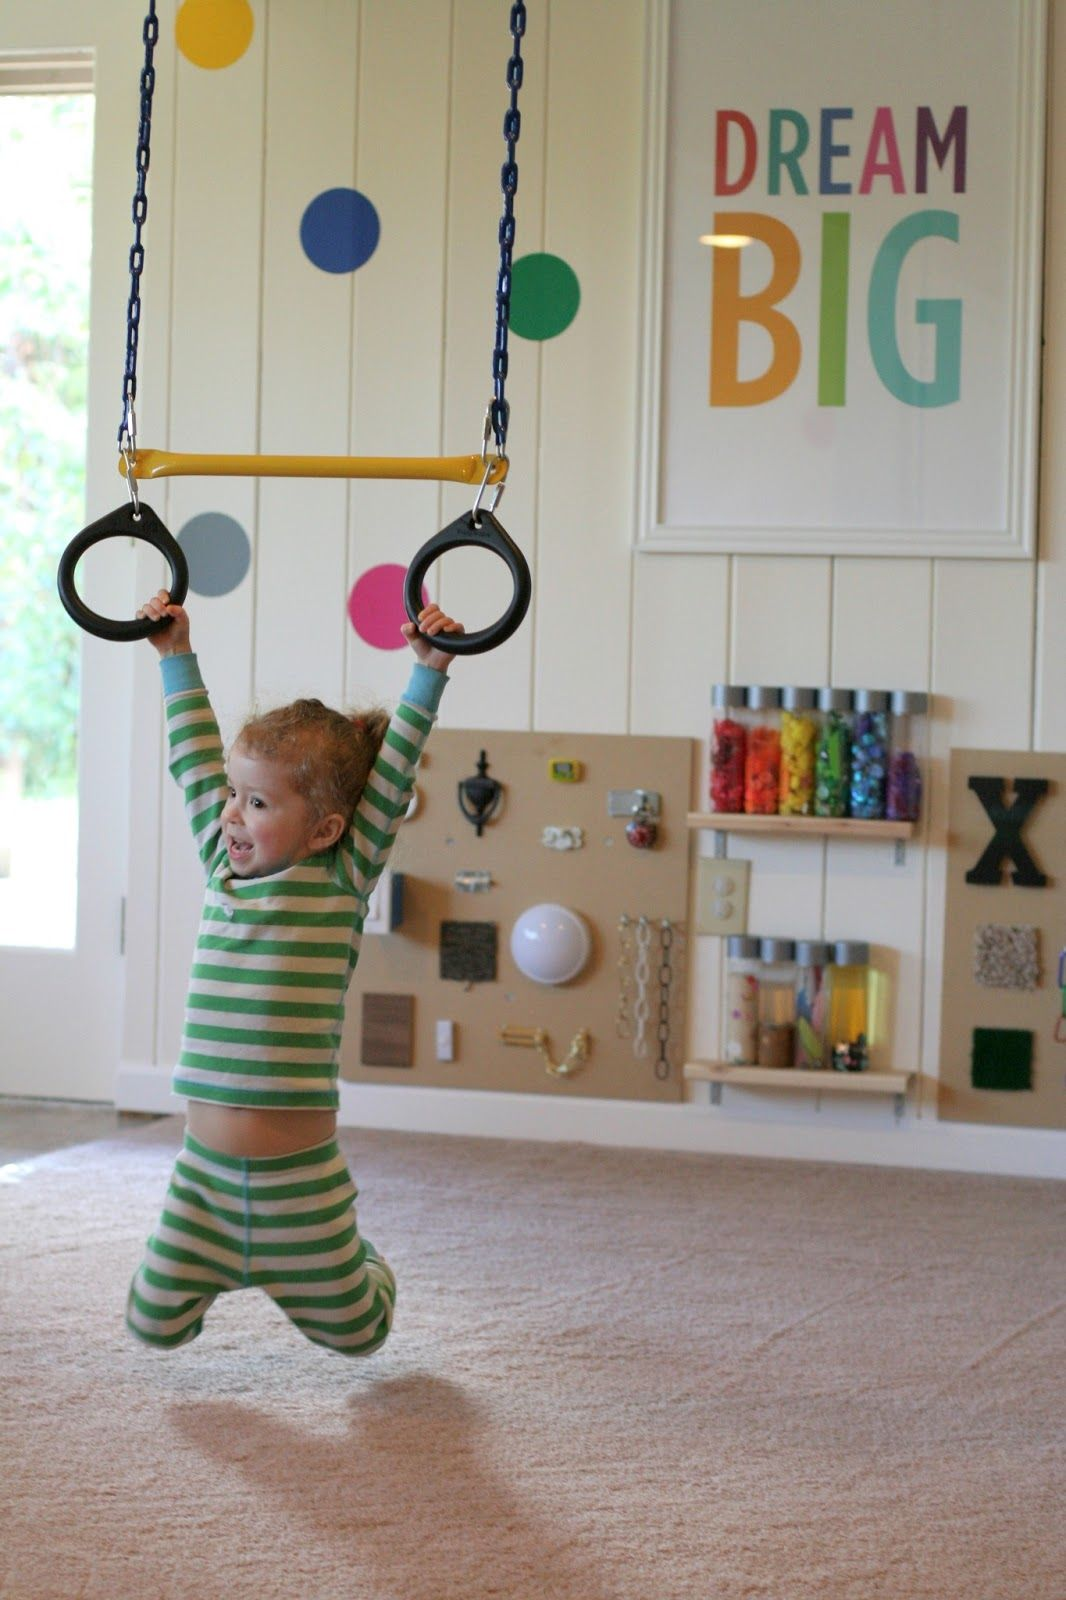 Playroom Design Diy Playroom With Rock Wall Diy Playroom